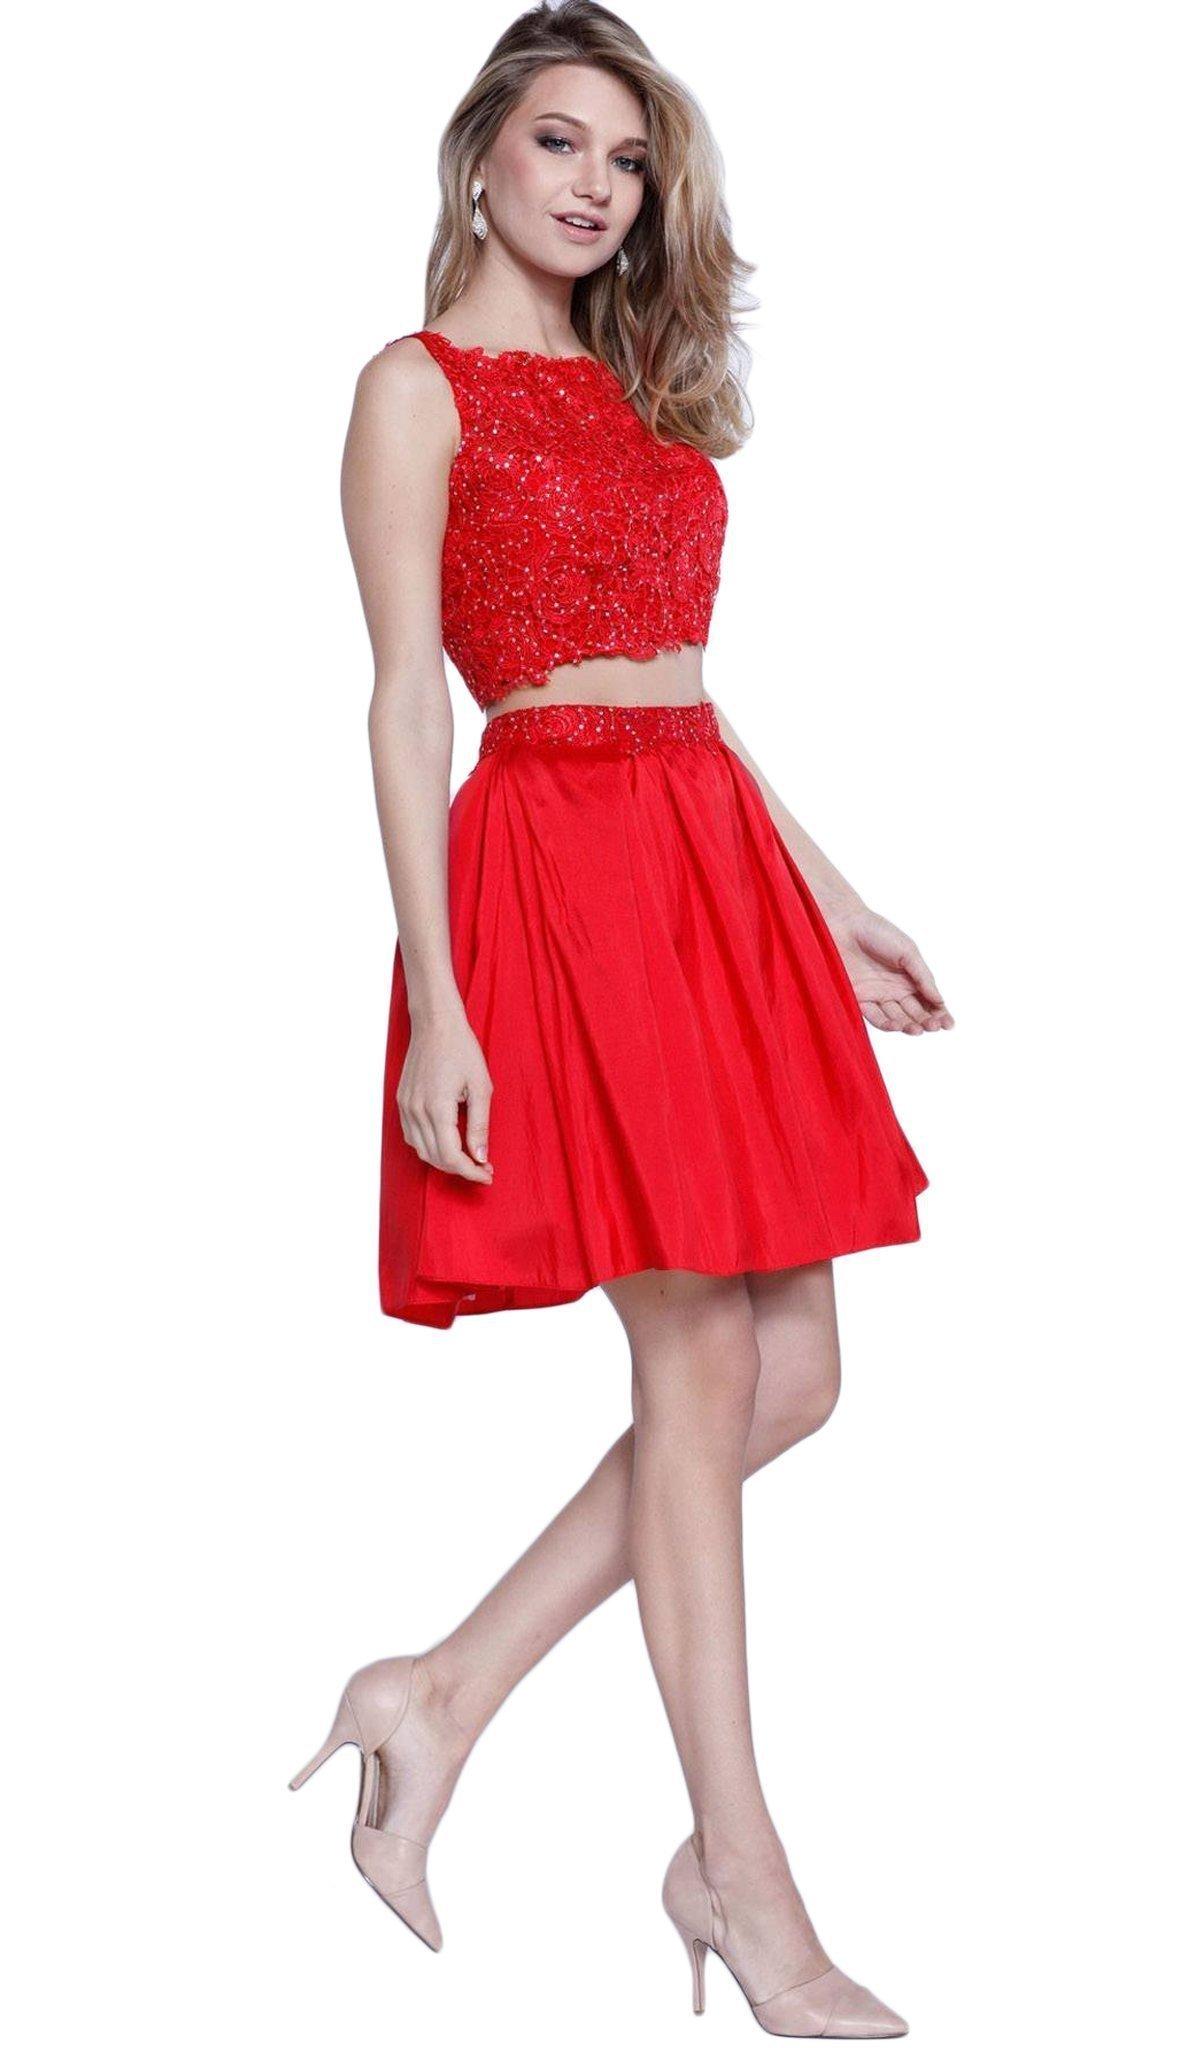 Nox Anabel - 6054 Embellished Bateau Neck Dress